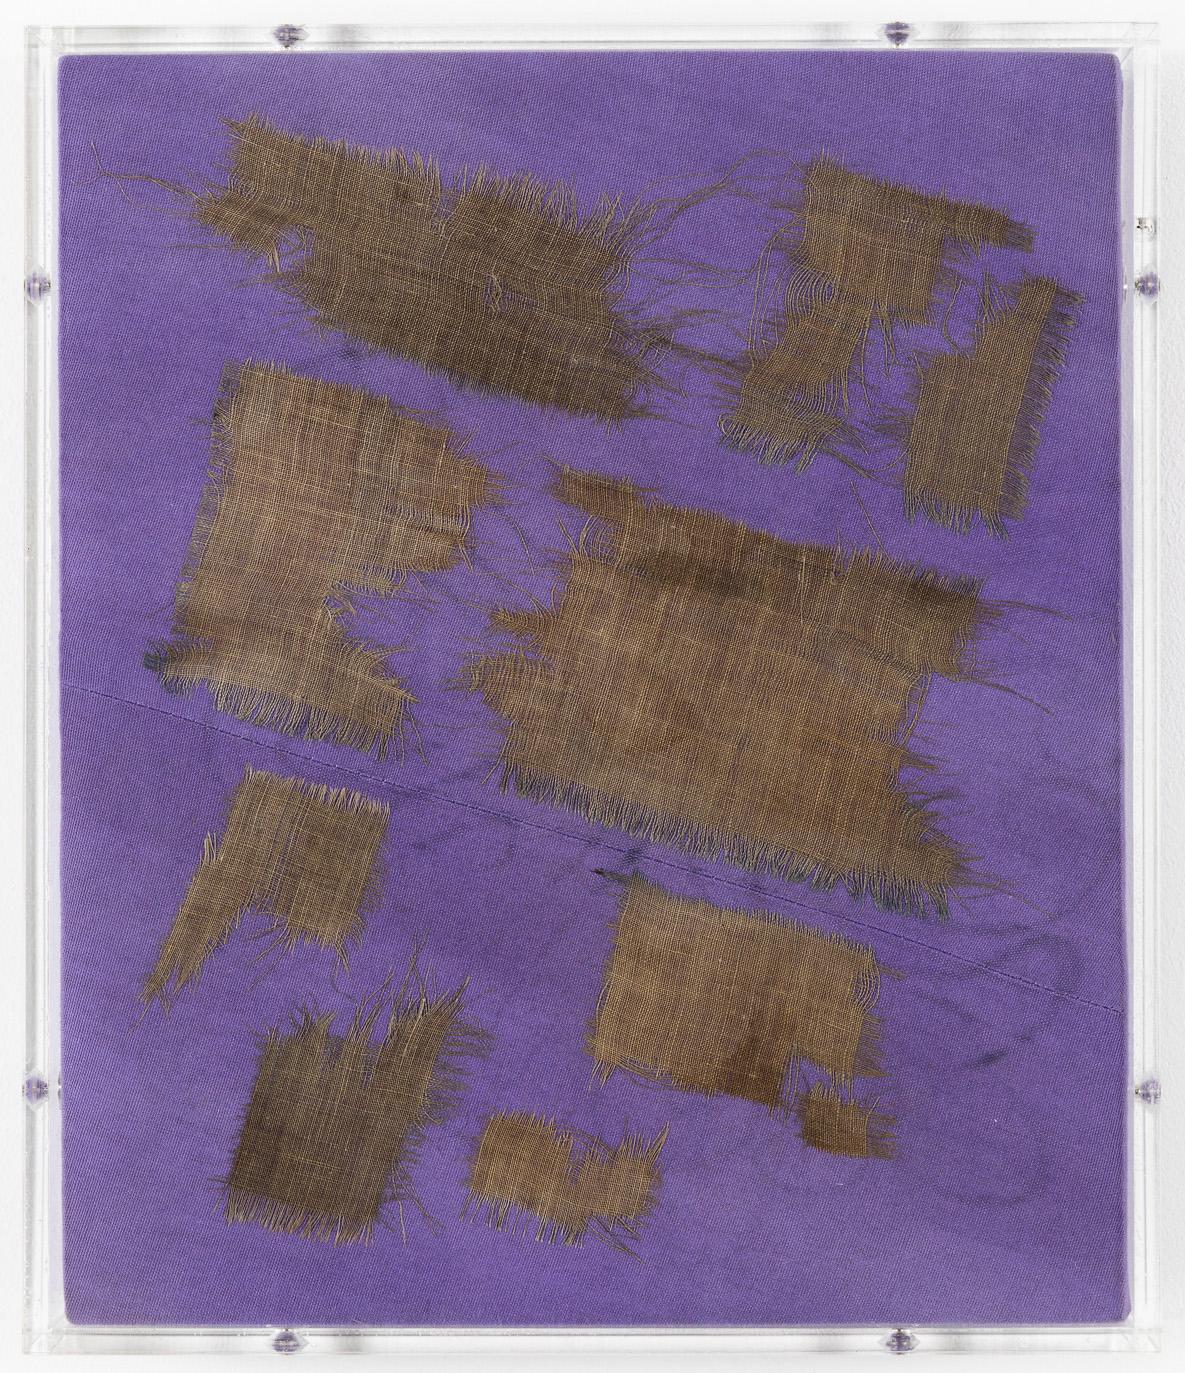 Minimal Information Purple, 2020. Textile in artist's frame (plexiglass, wood and aluminum), 31 x 26,5 x 4,5 cm